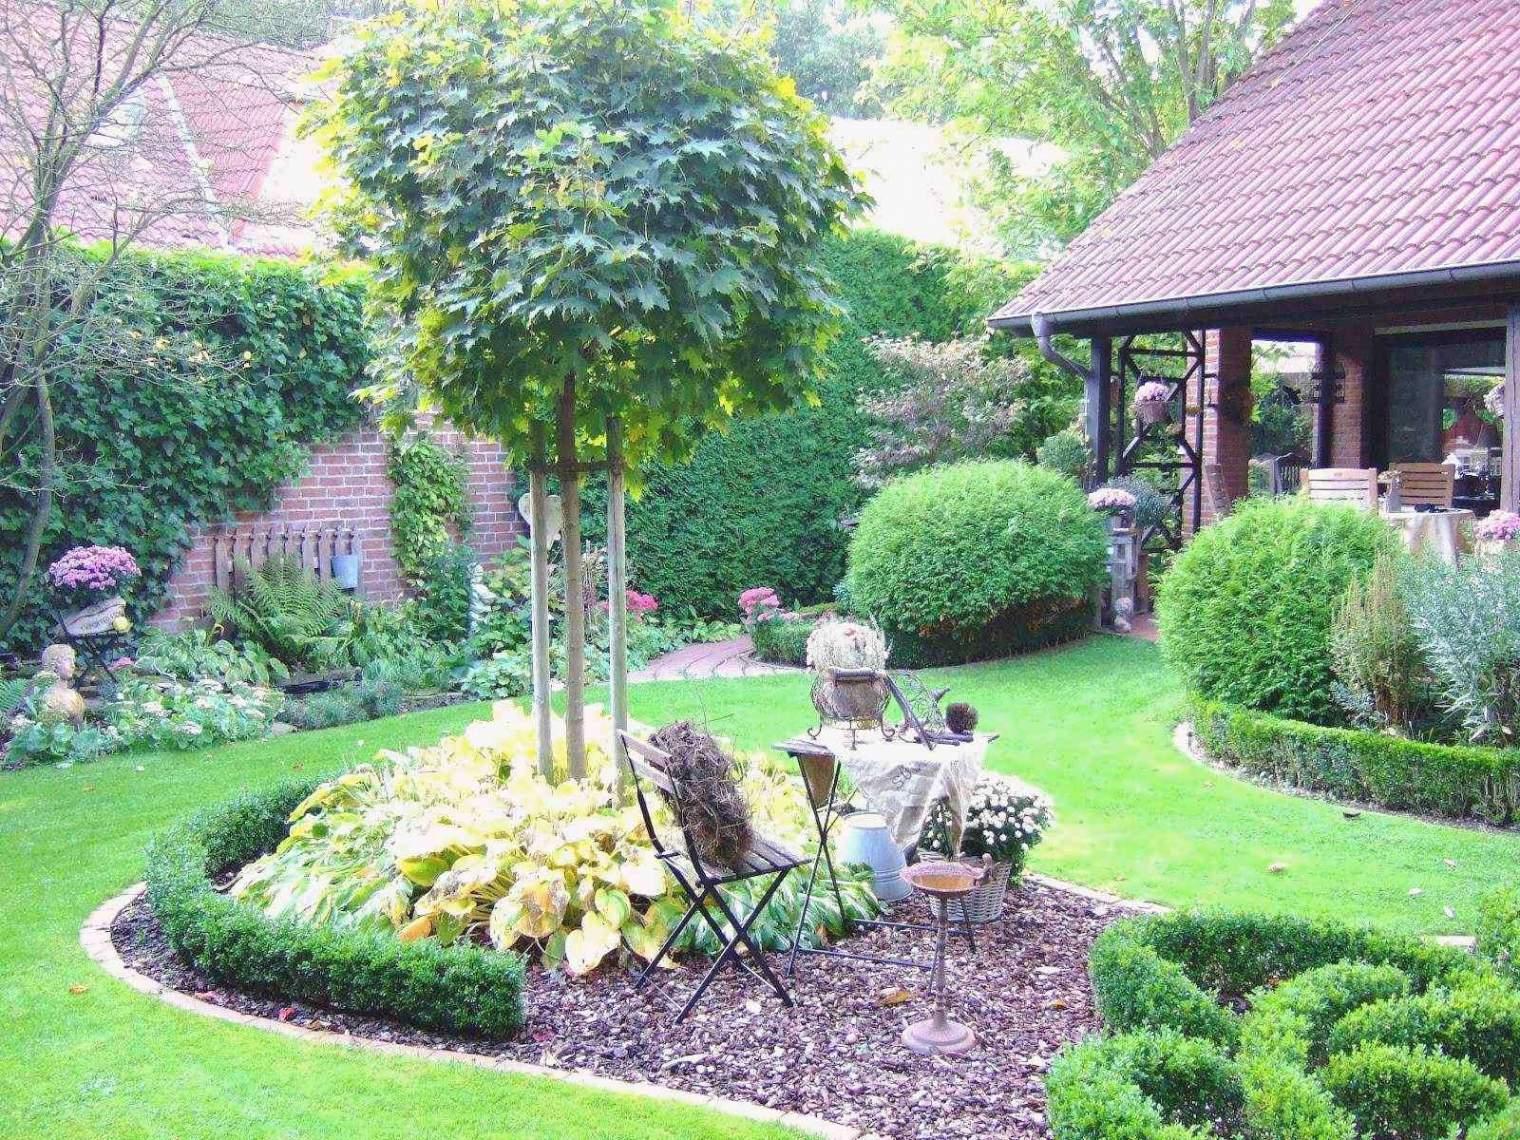 Garten Planung Elegant Alten Garten Neu Anlegen — Temobardz Home Blog